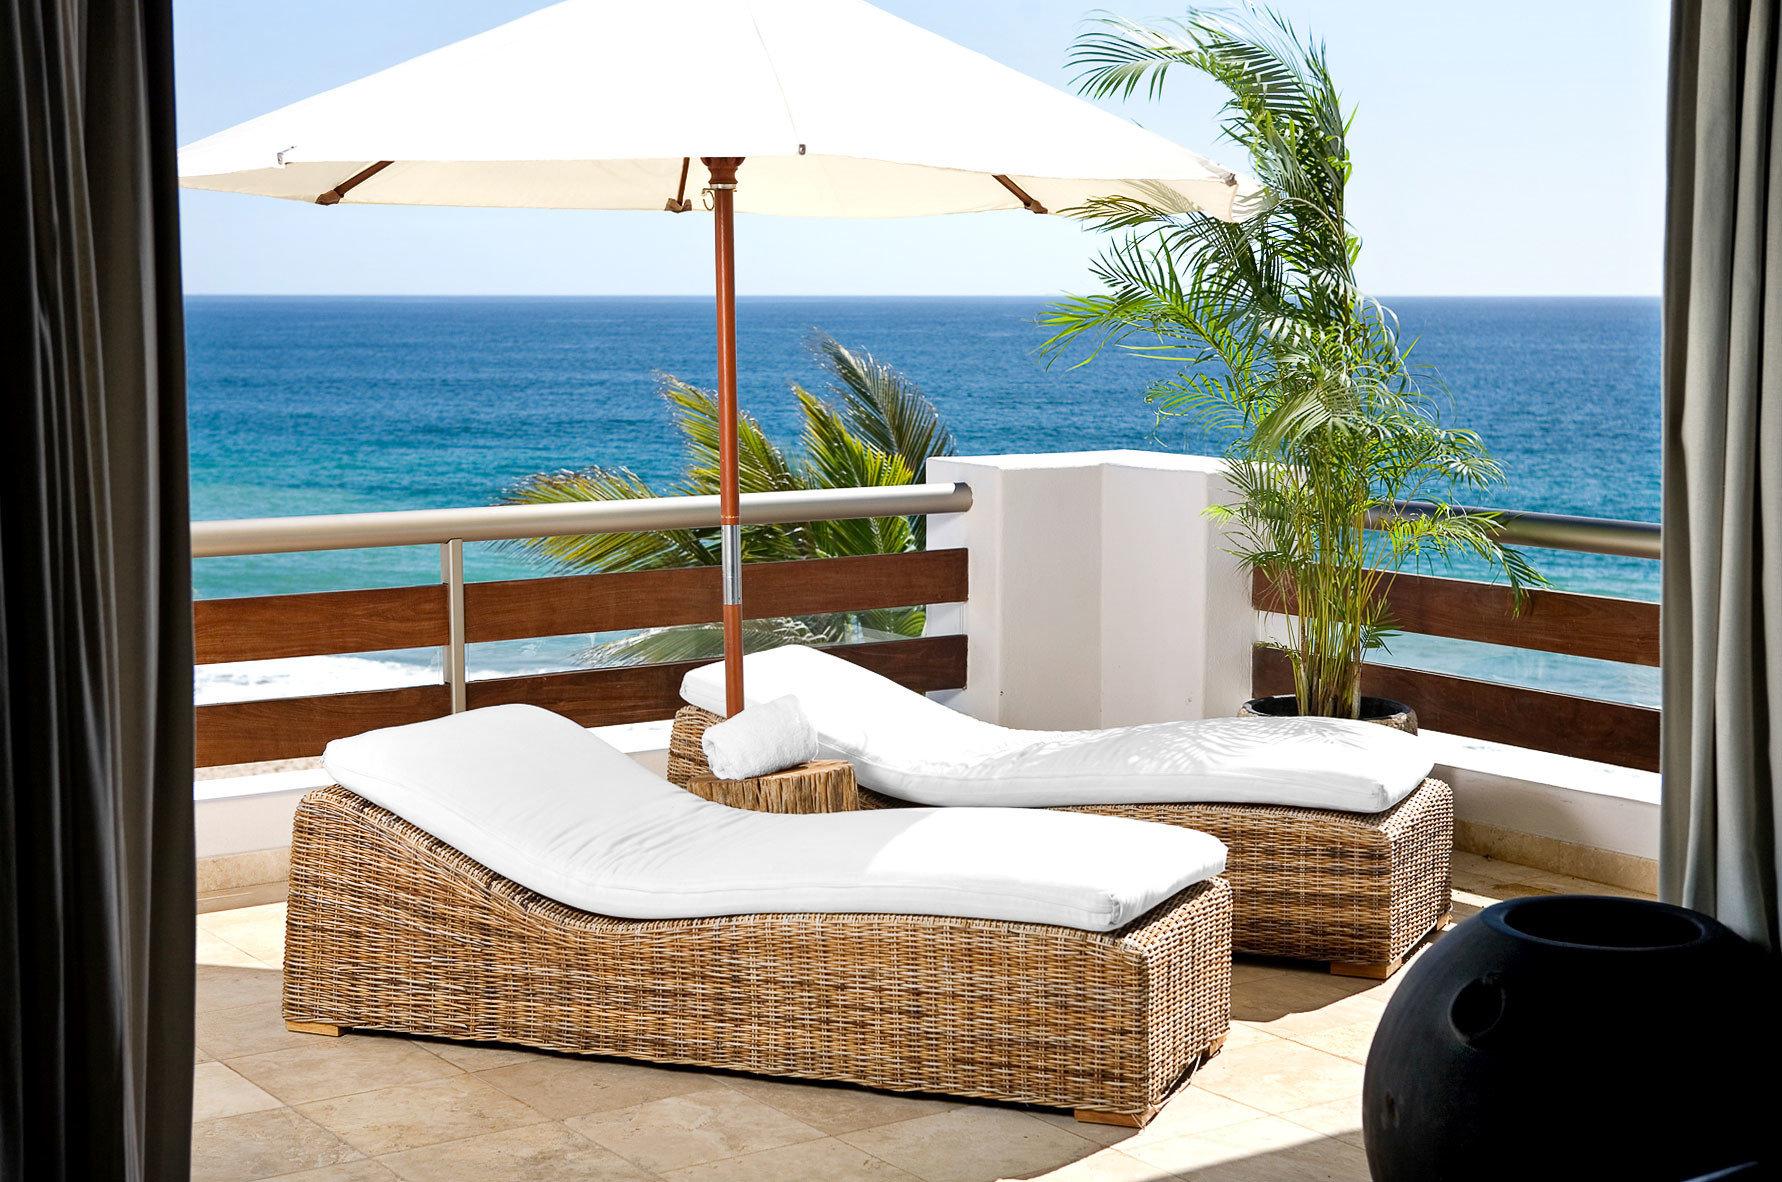 Beach Beachfront Lounge Luxury Patio sky water property swimming pool Ocean overlooking Villa home cottage living room condominium Resort Suite shore